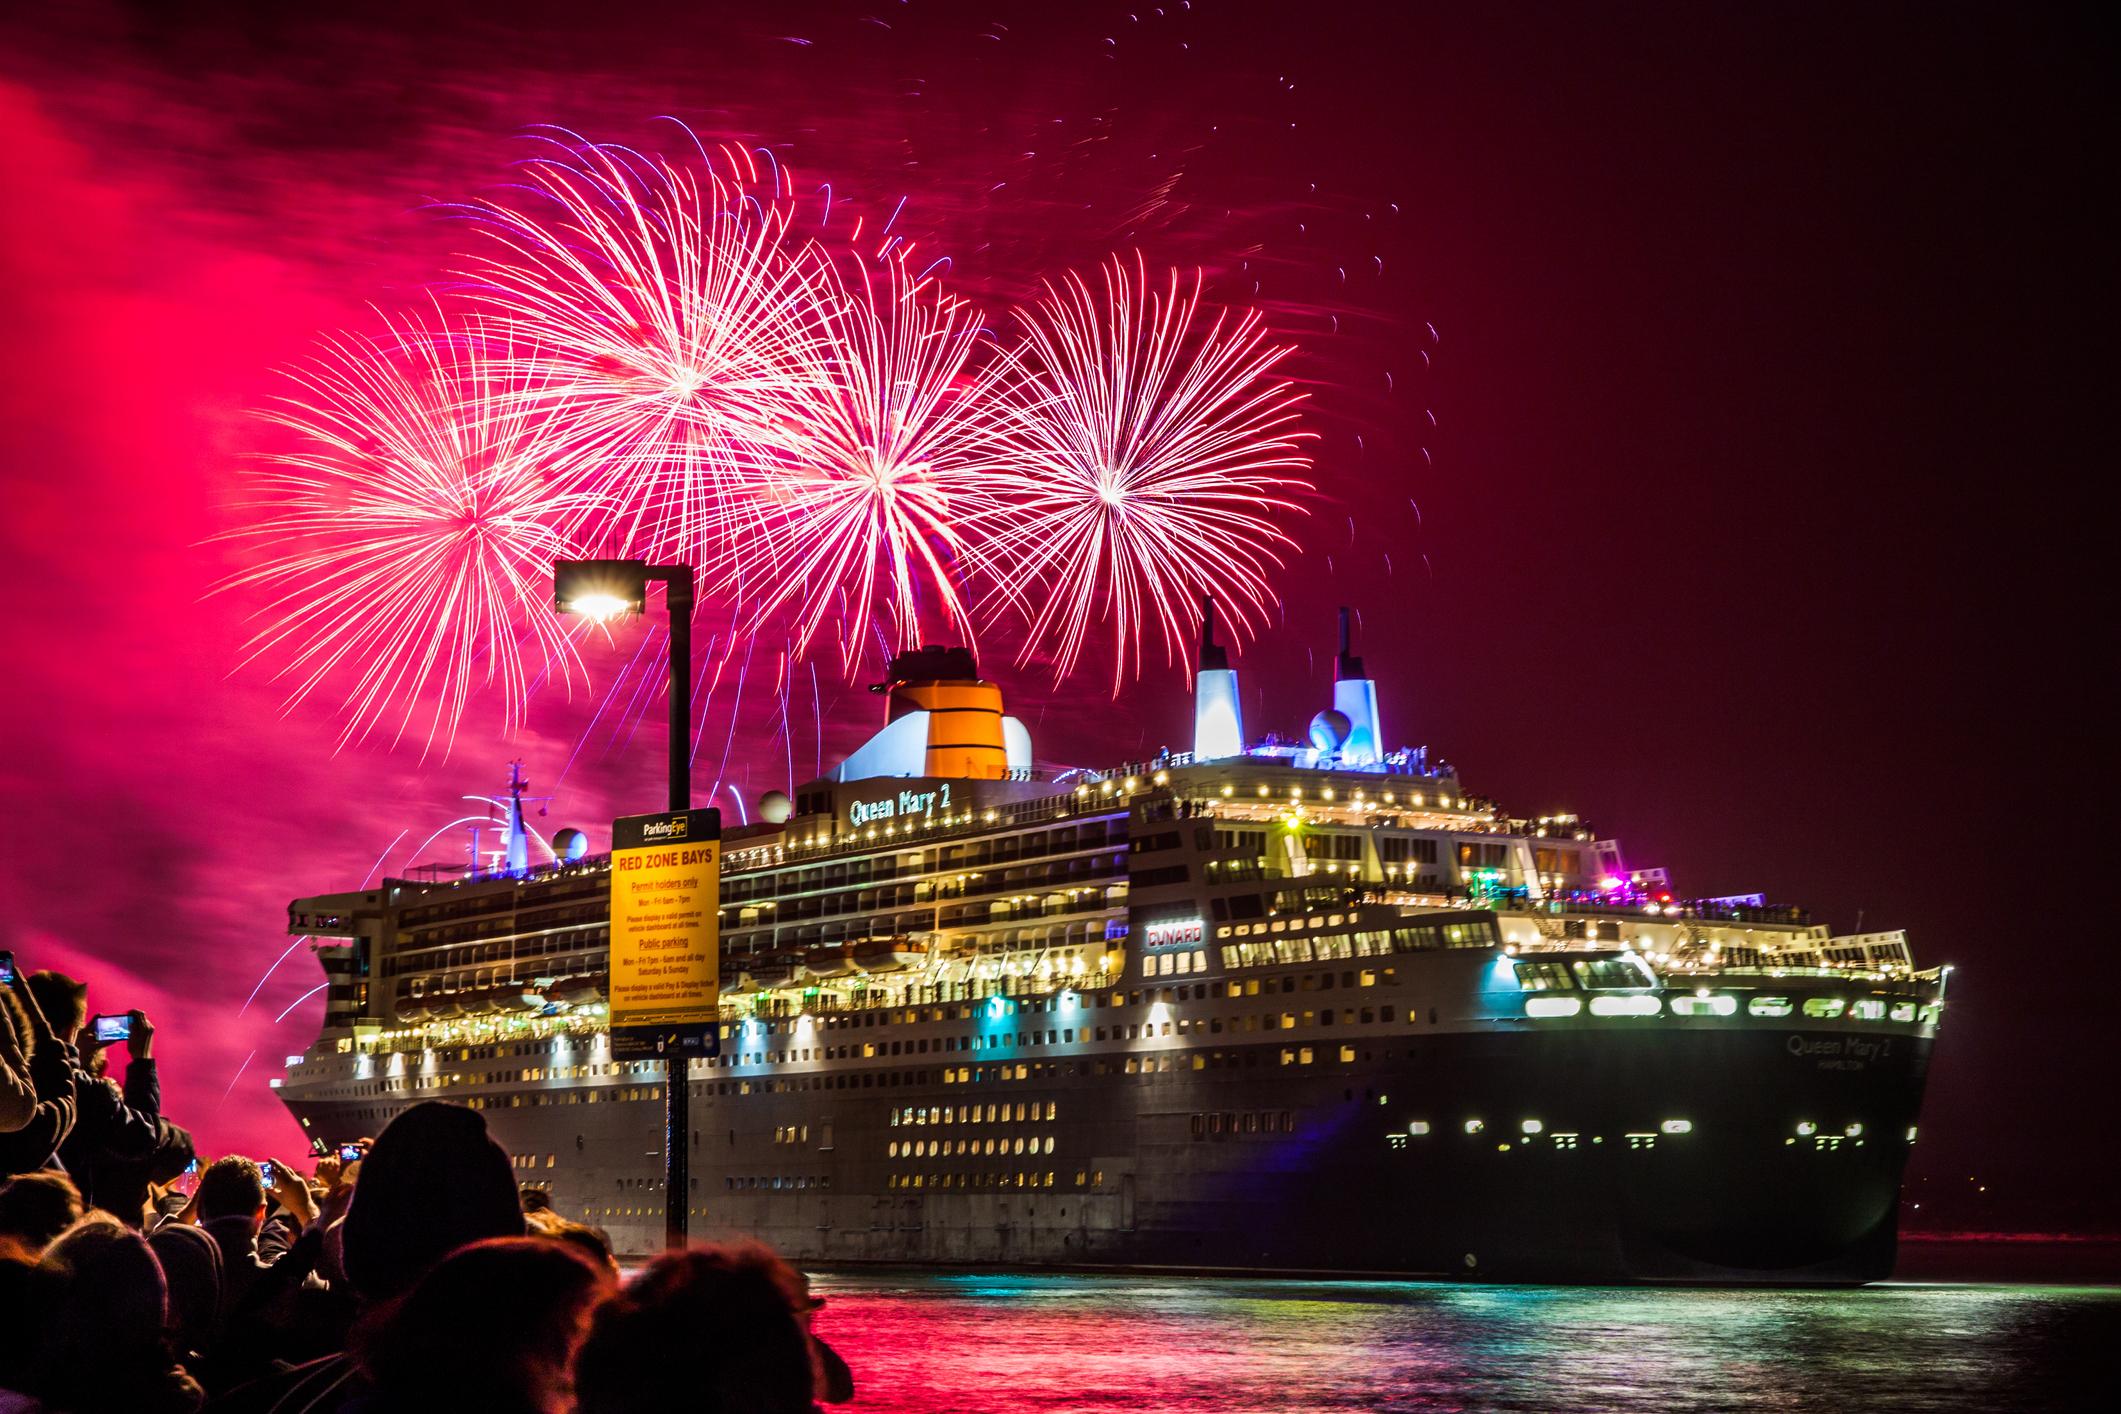 <em>Queen Mary 2:</em> A trip to the age of elegance